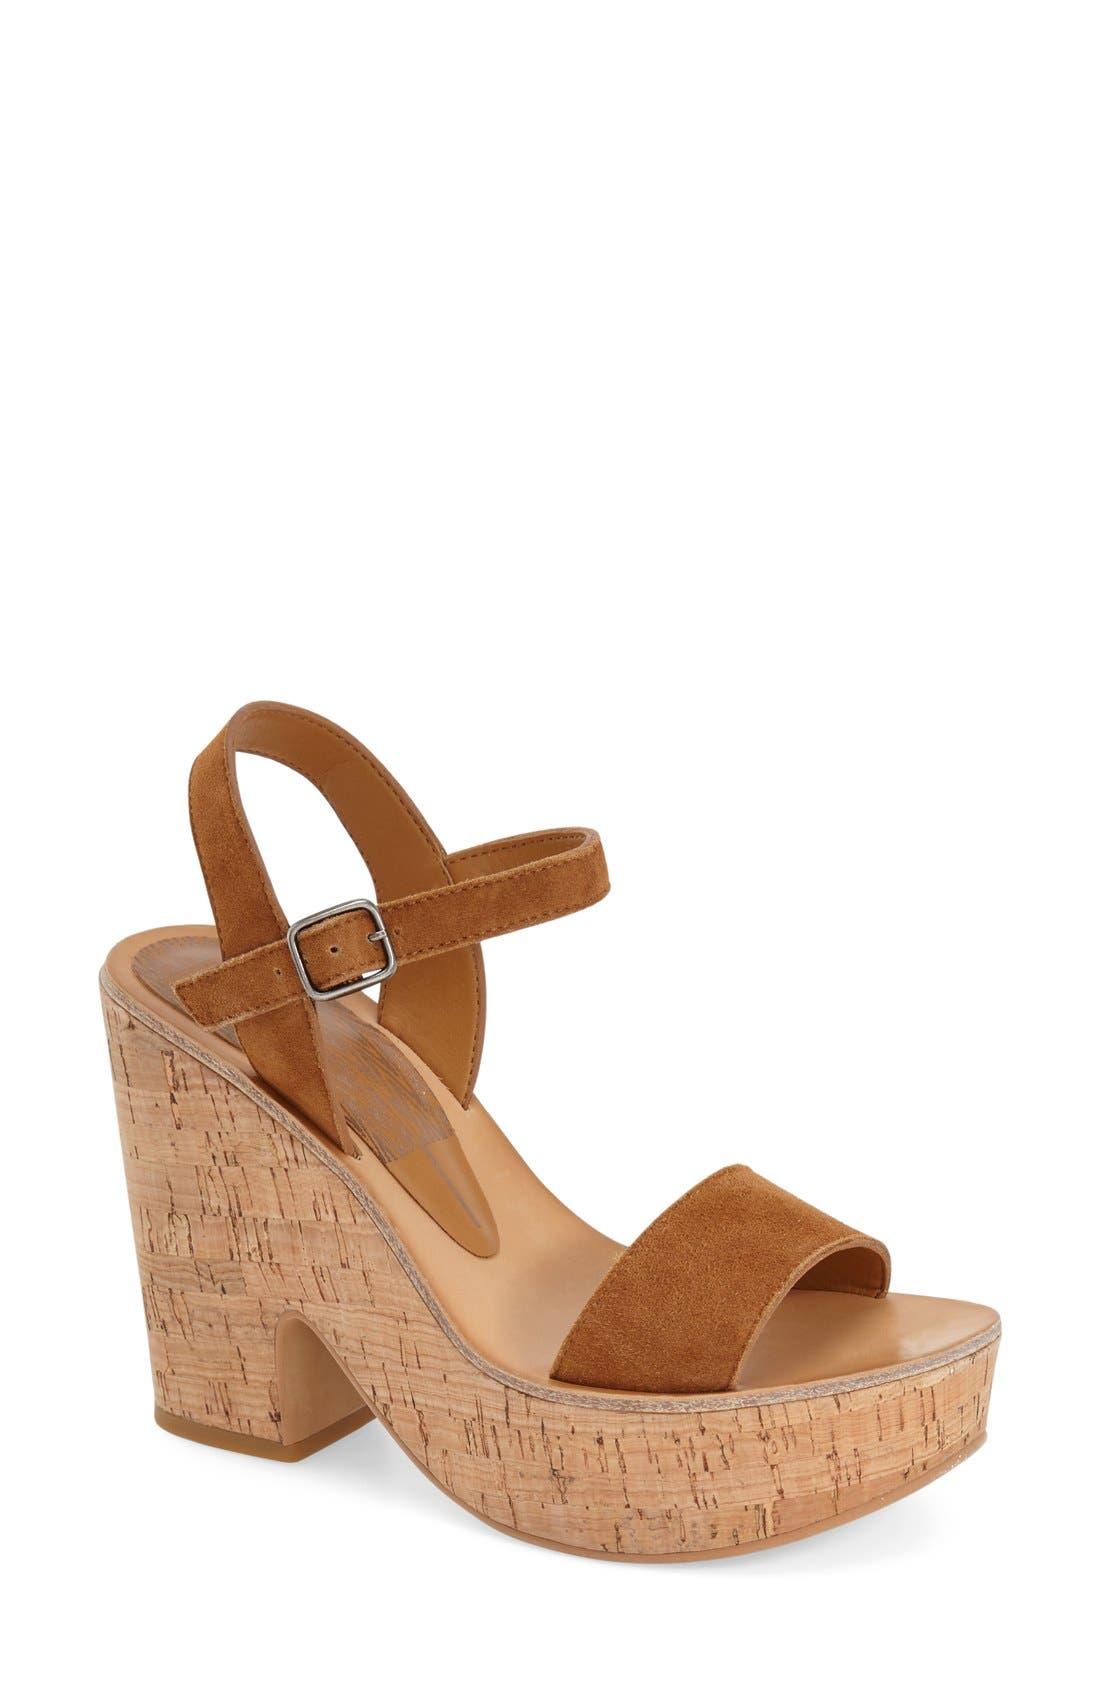 Alternate Image 1 Selected - Dolce Vita 'Randi' Platform Sandal (Women)